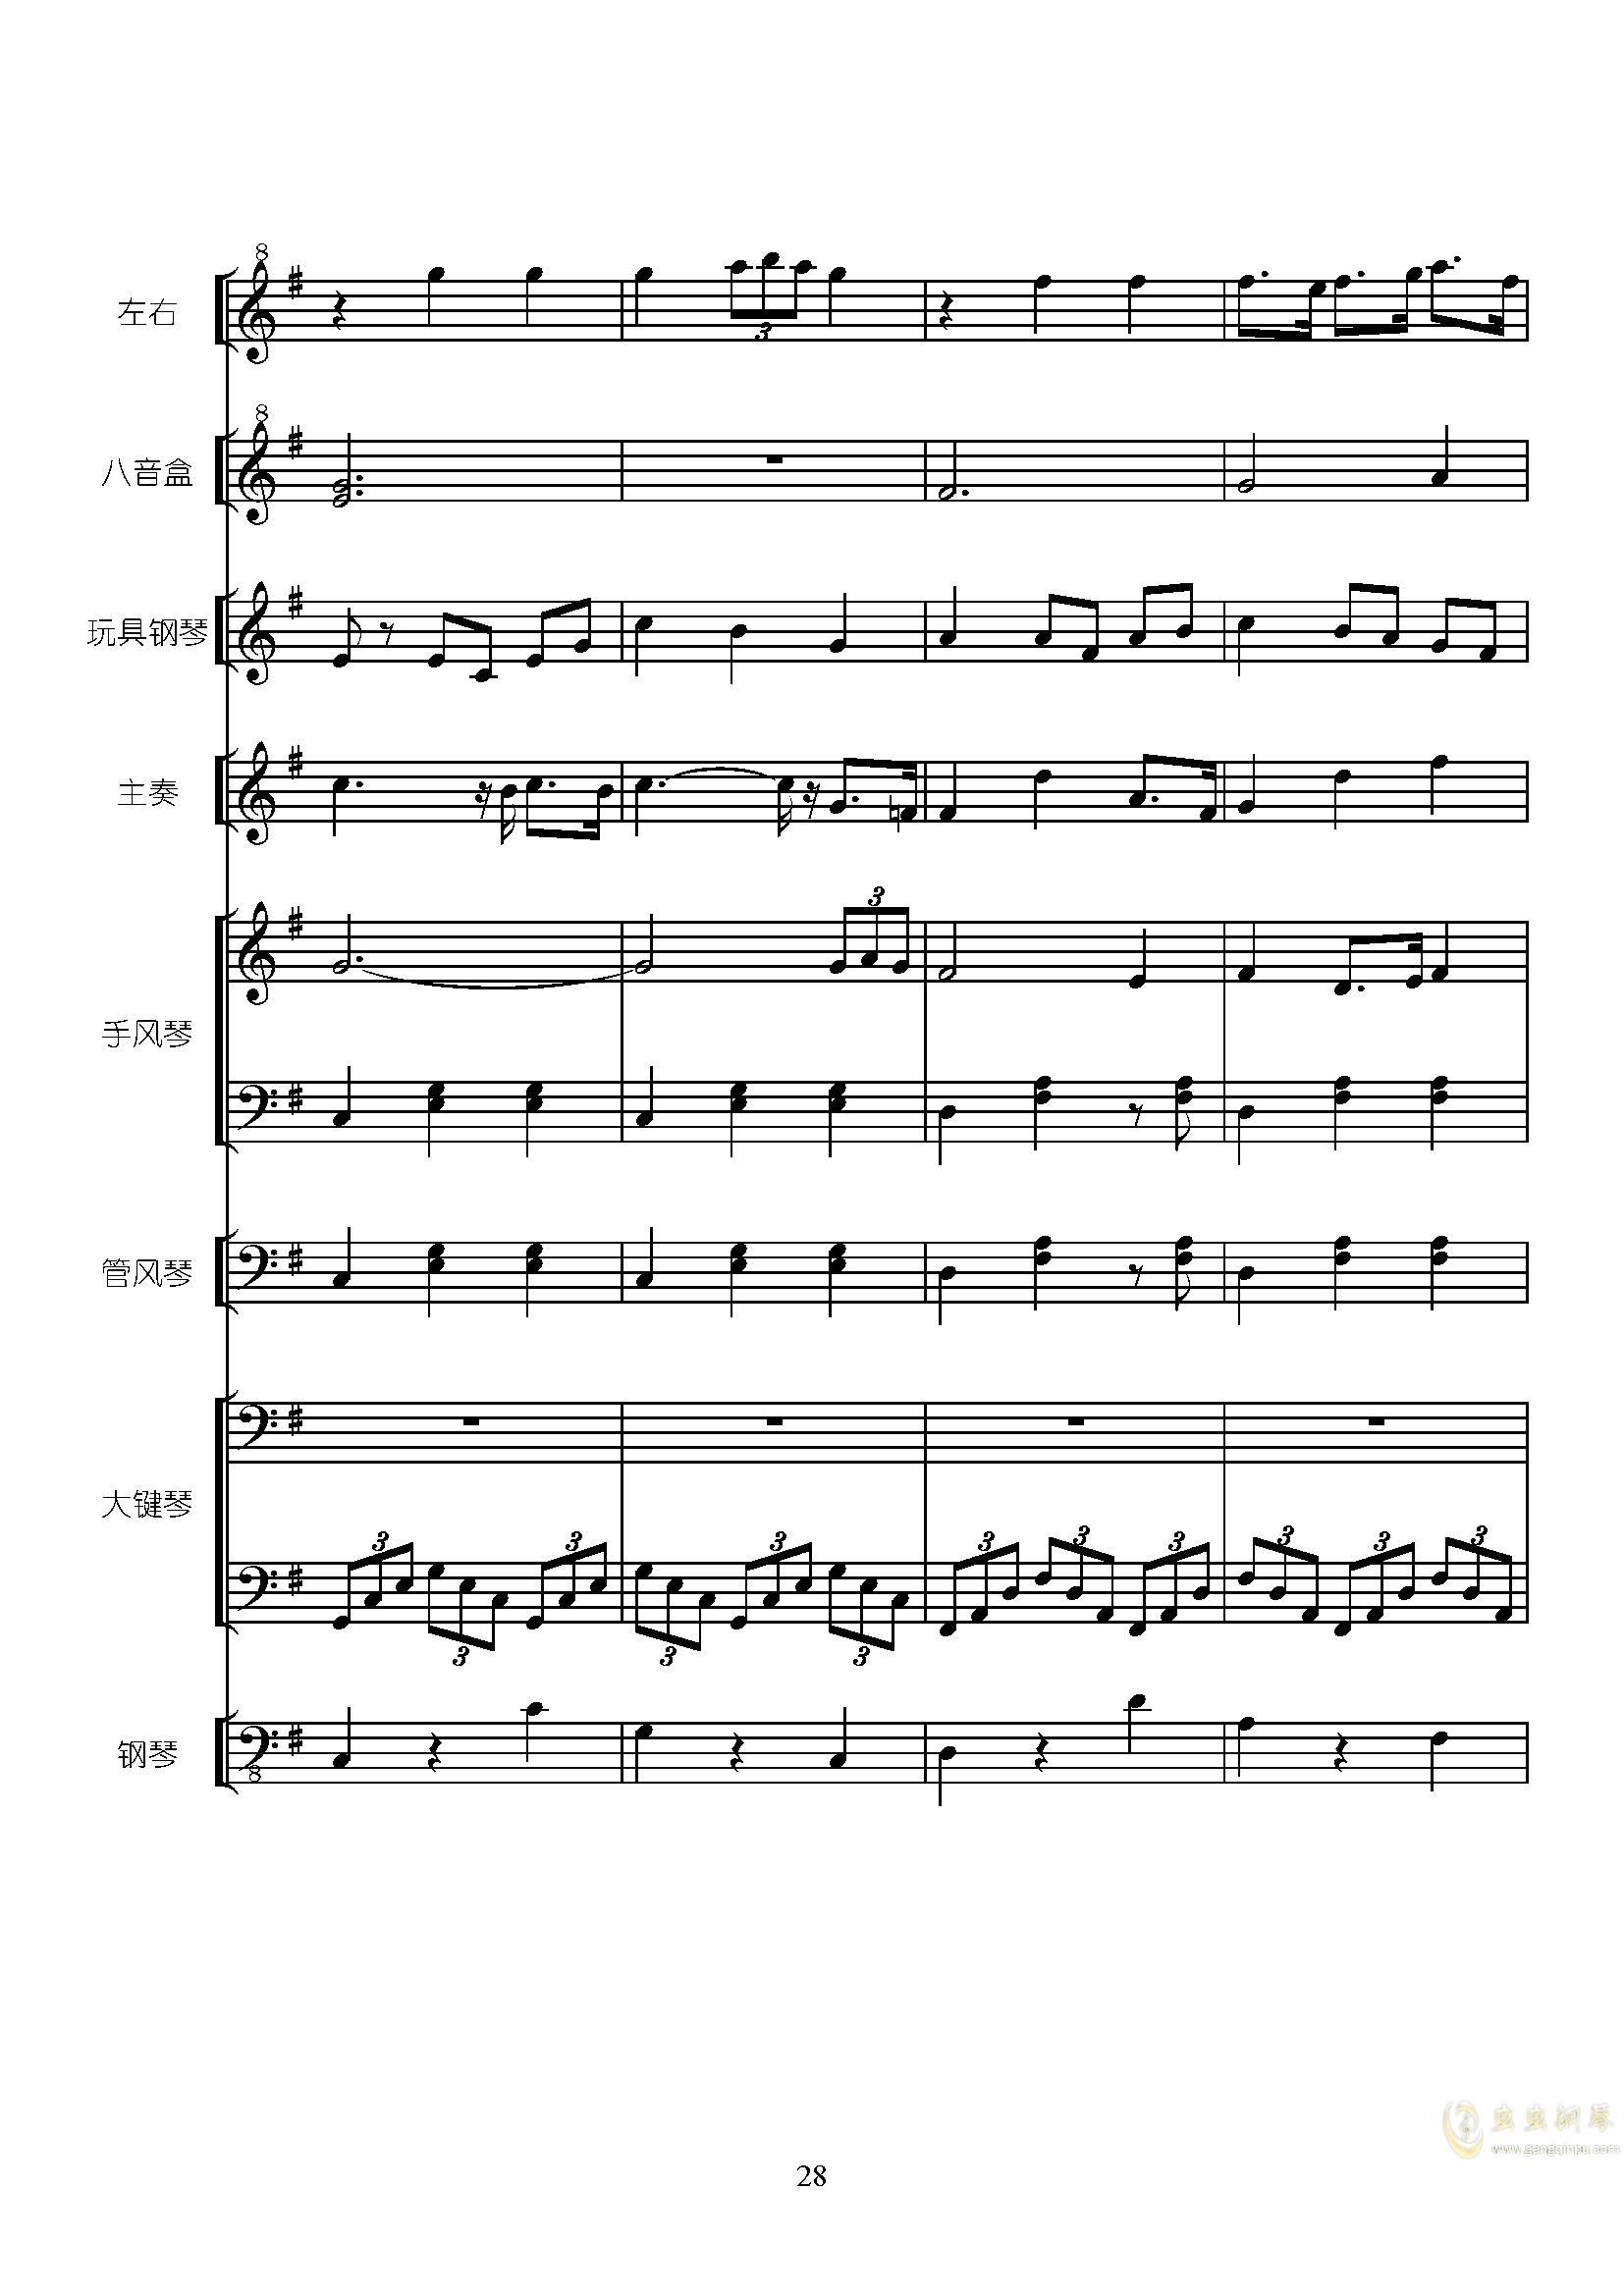 RainBowRain钢琴谱 第28页